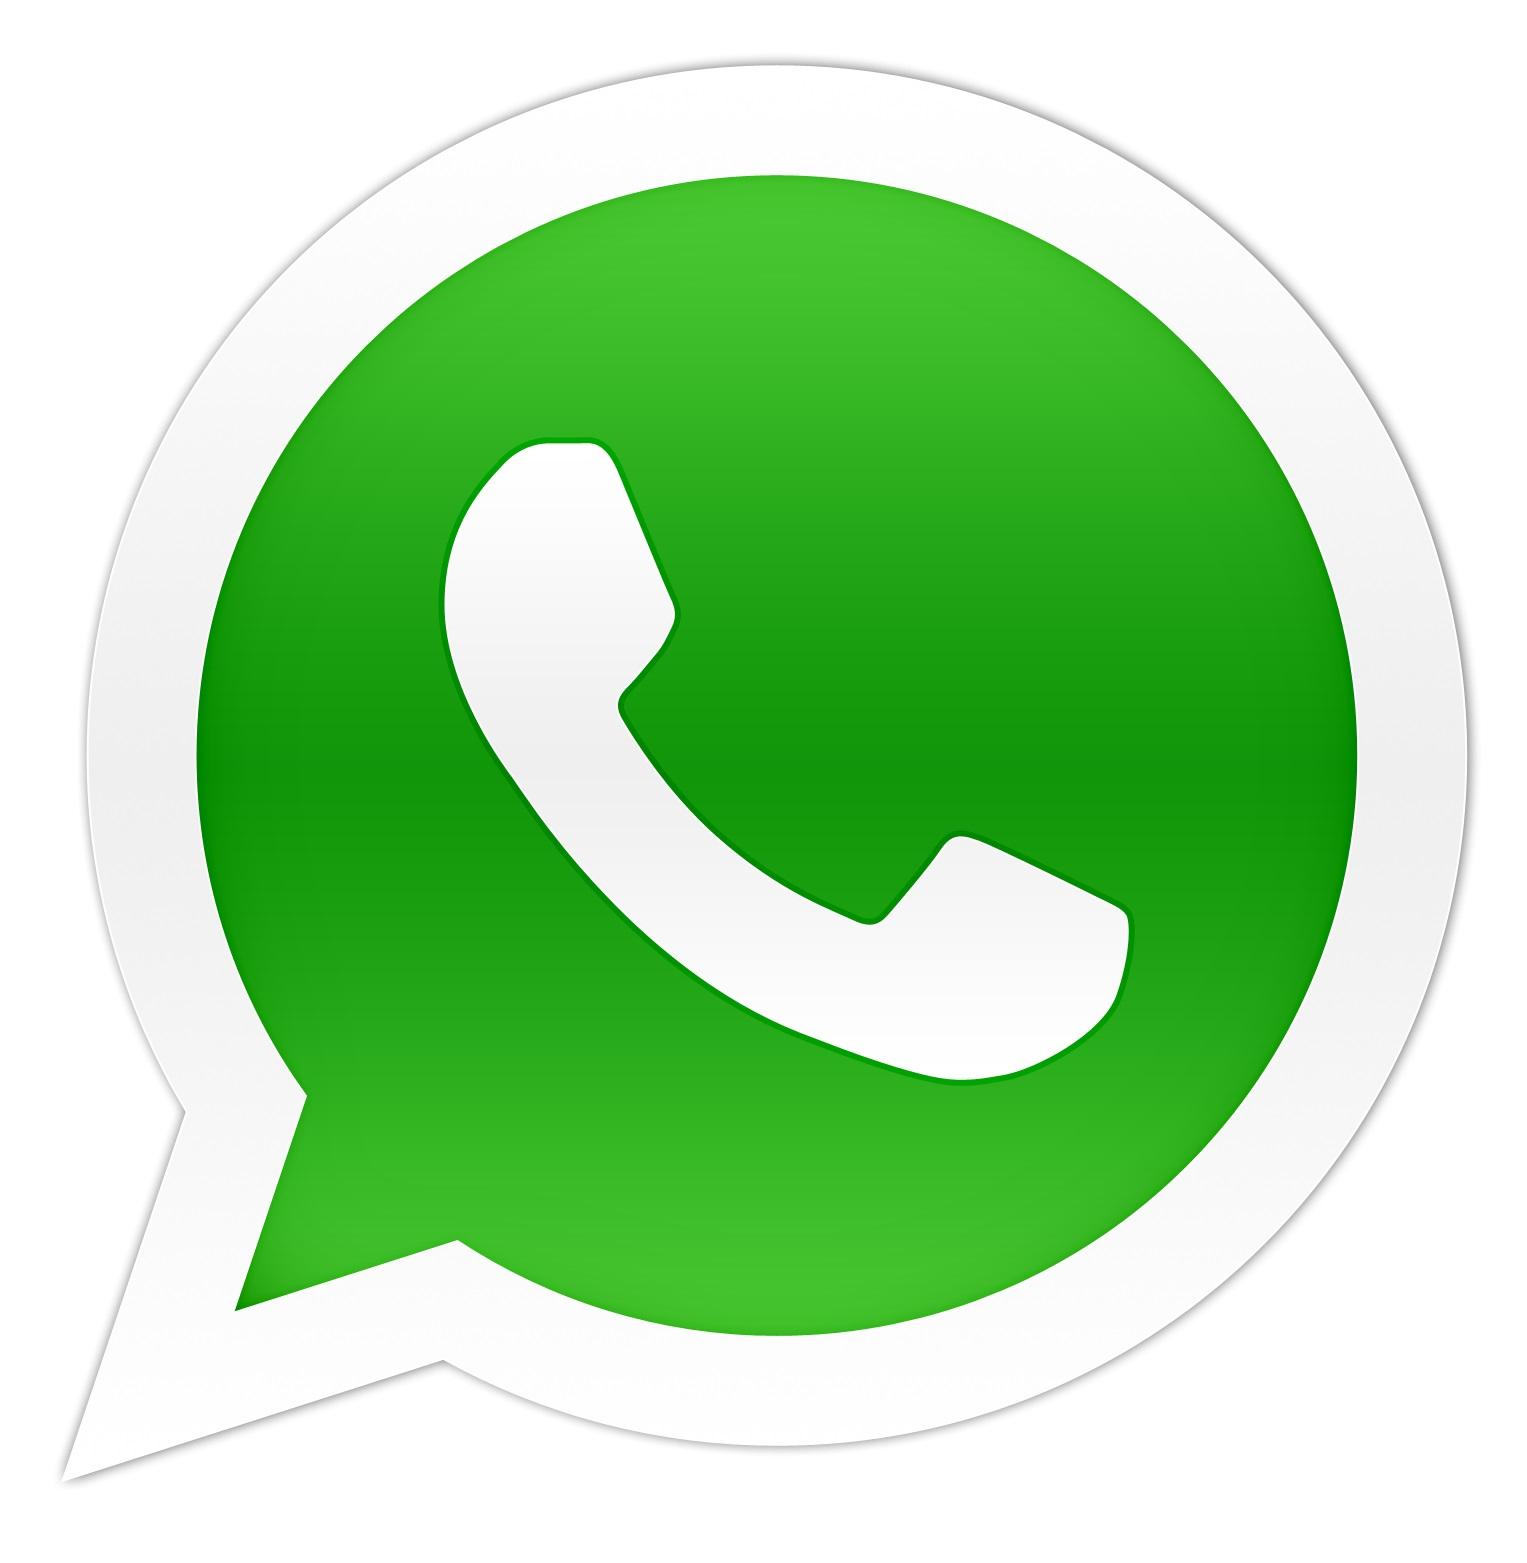 Sampex agora atende via Whatsapp